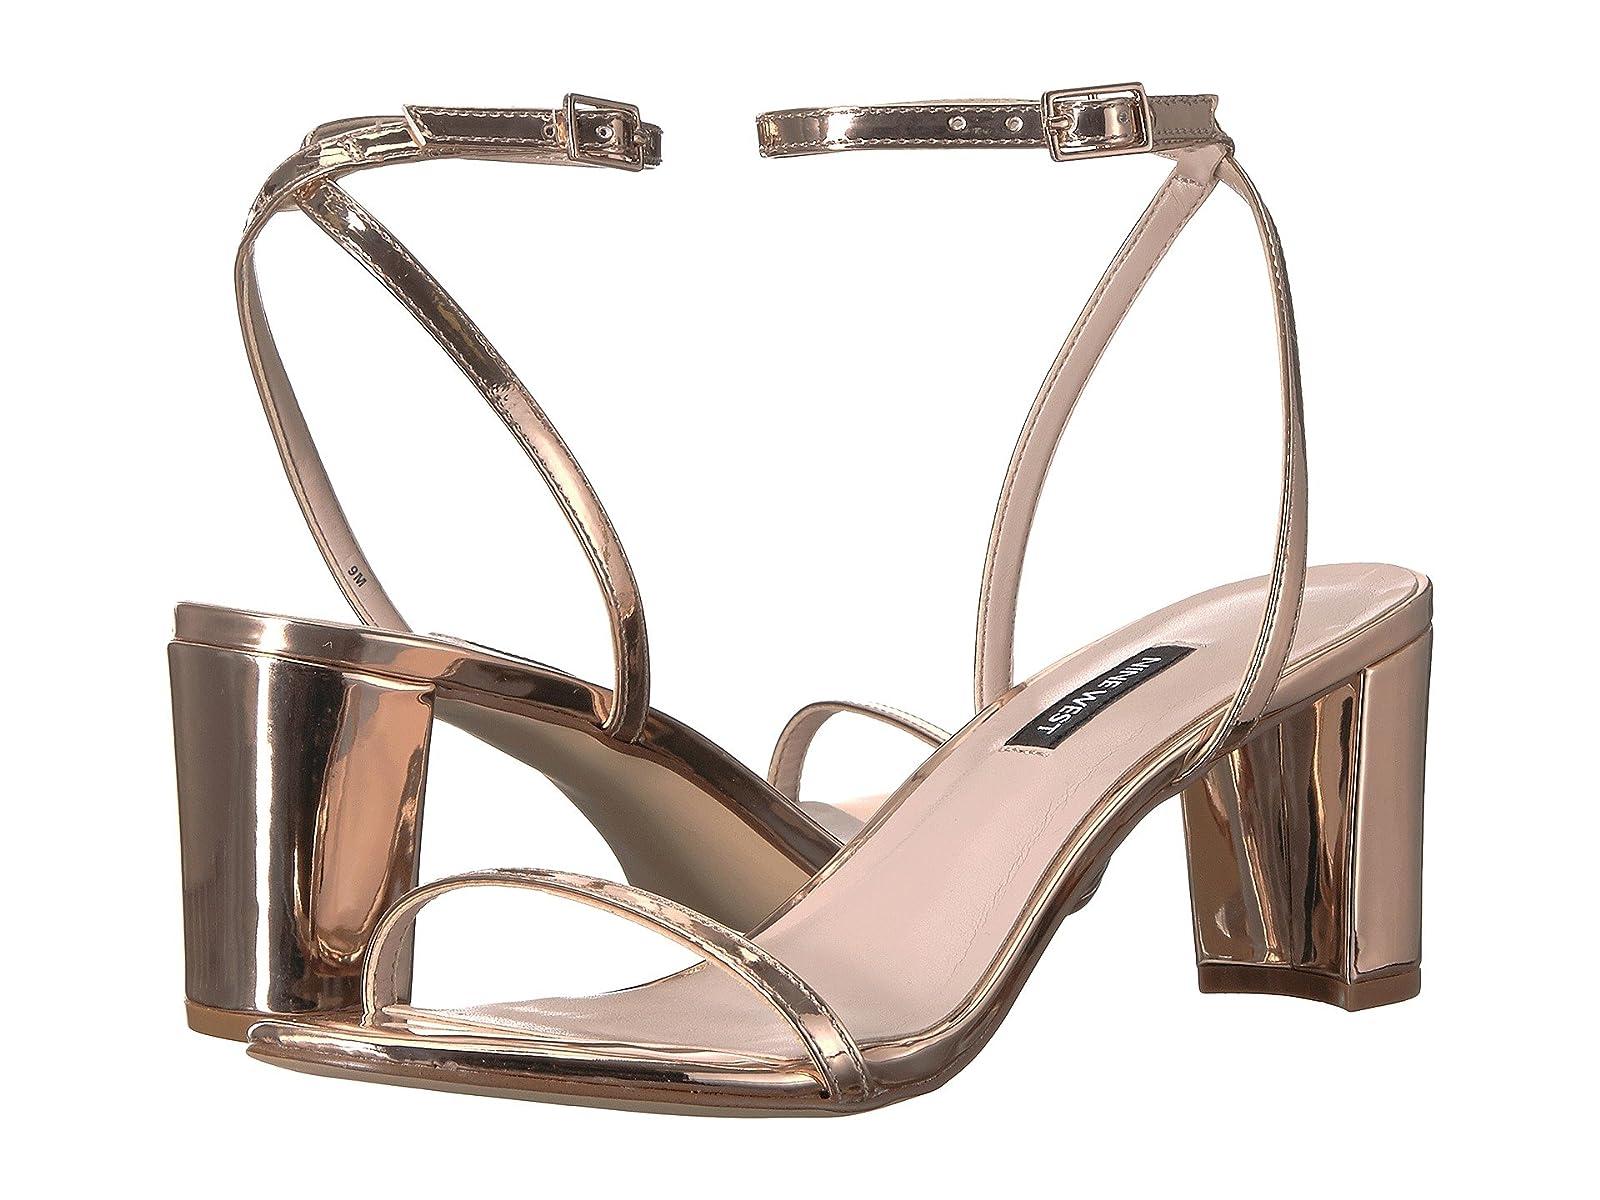 Nine West Provein Block Heel SandalCheap and distinctive eye-catching shoes